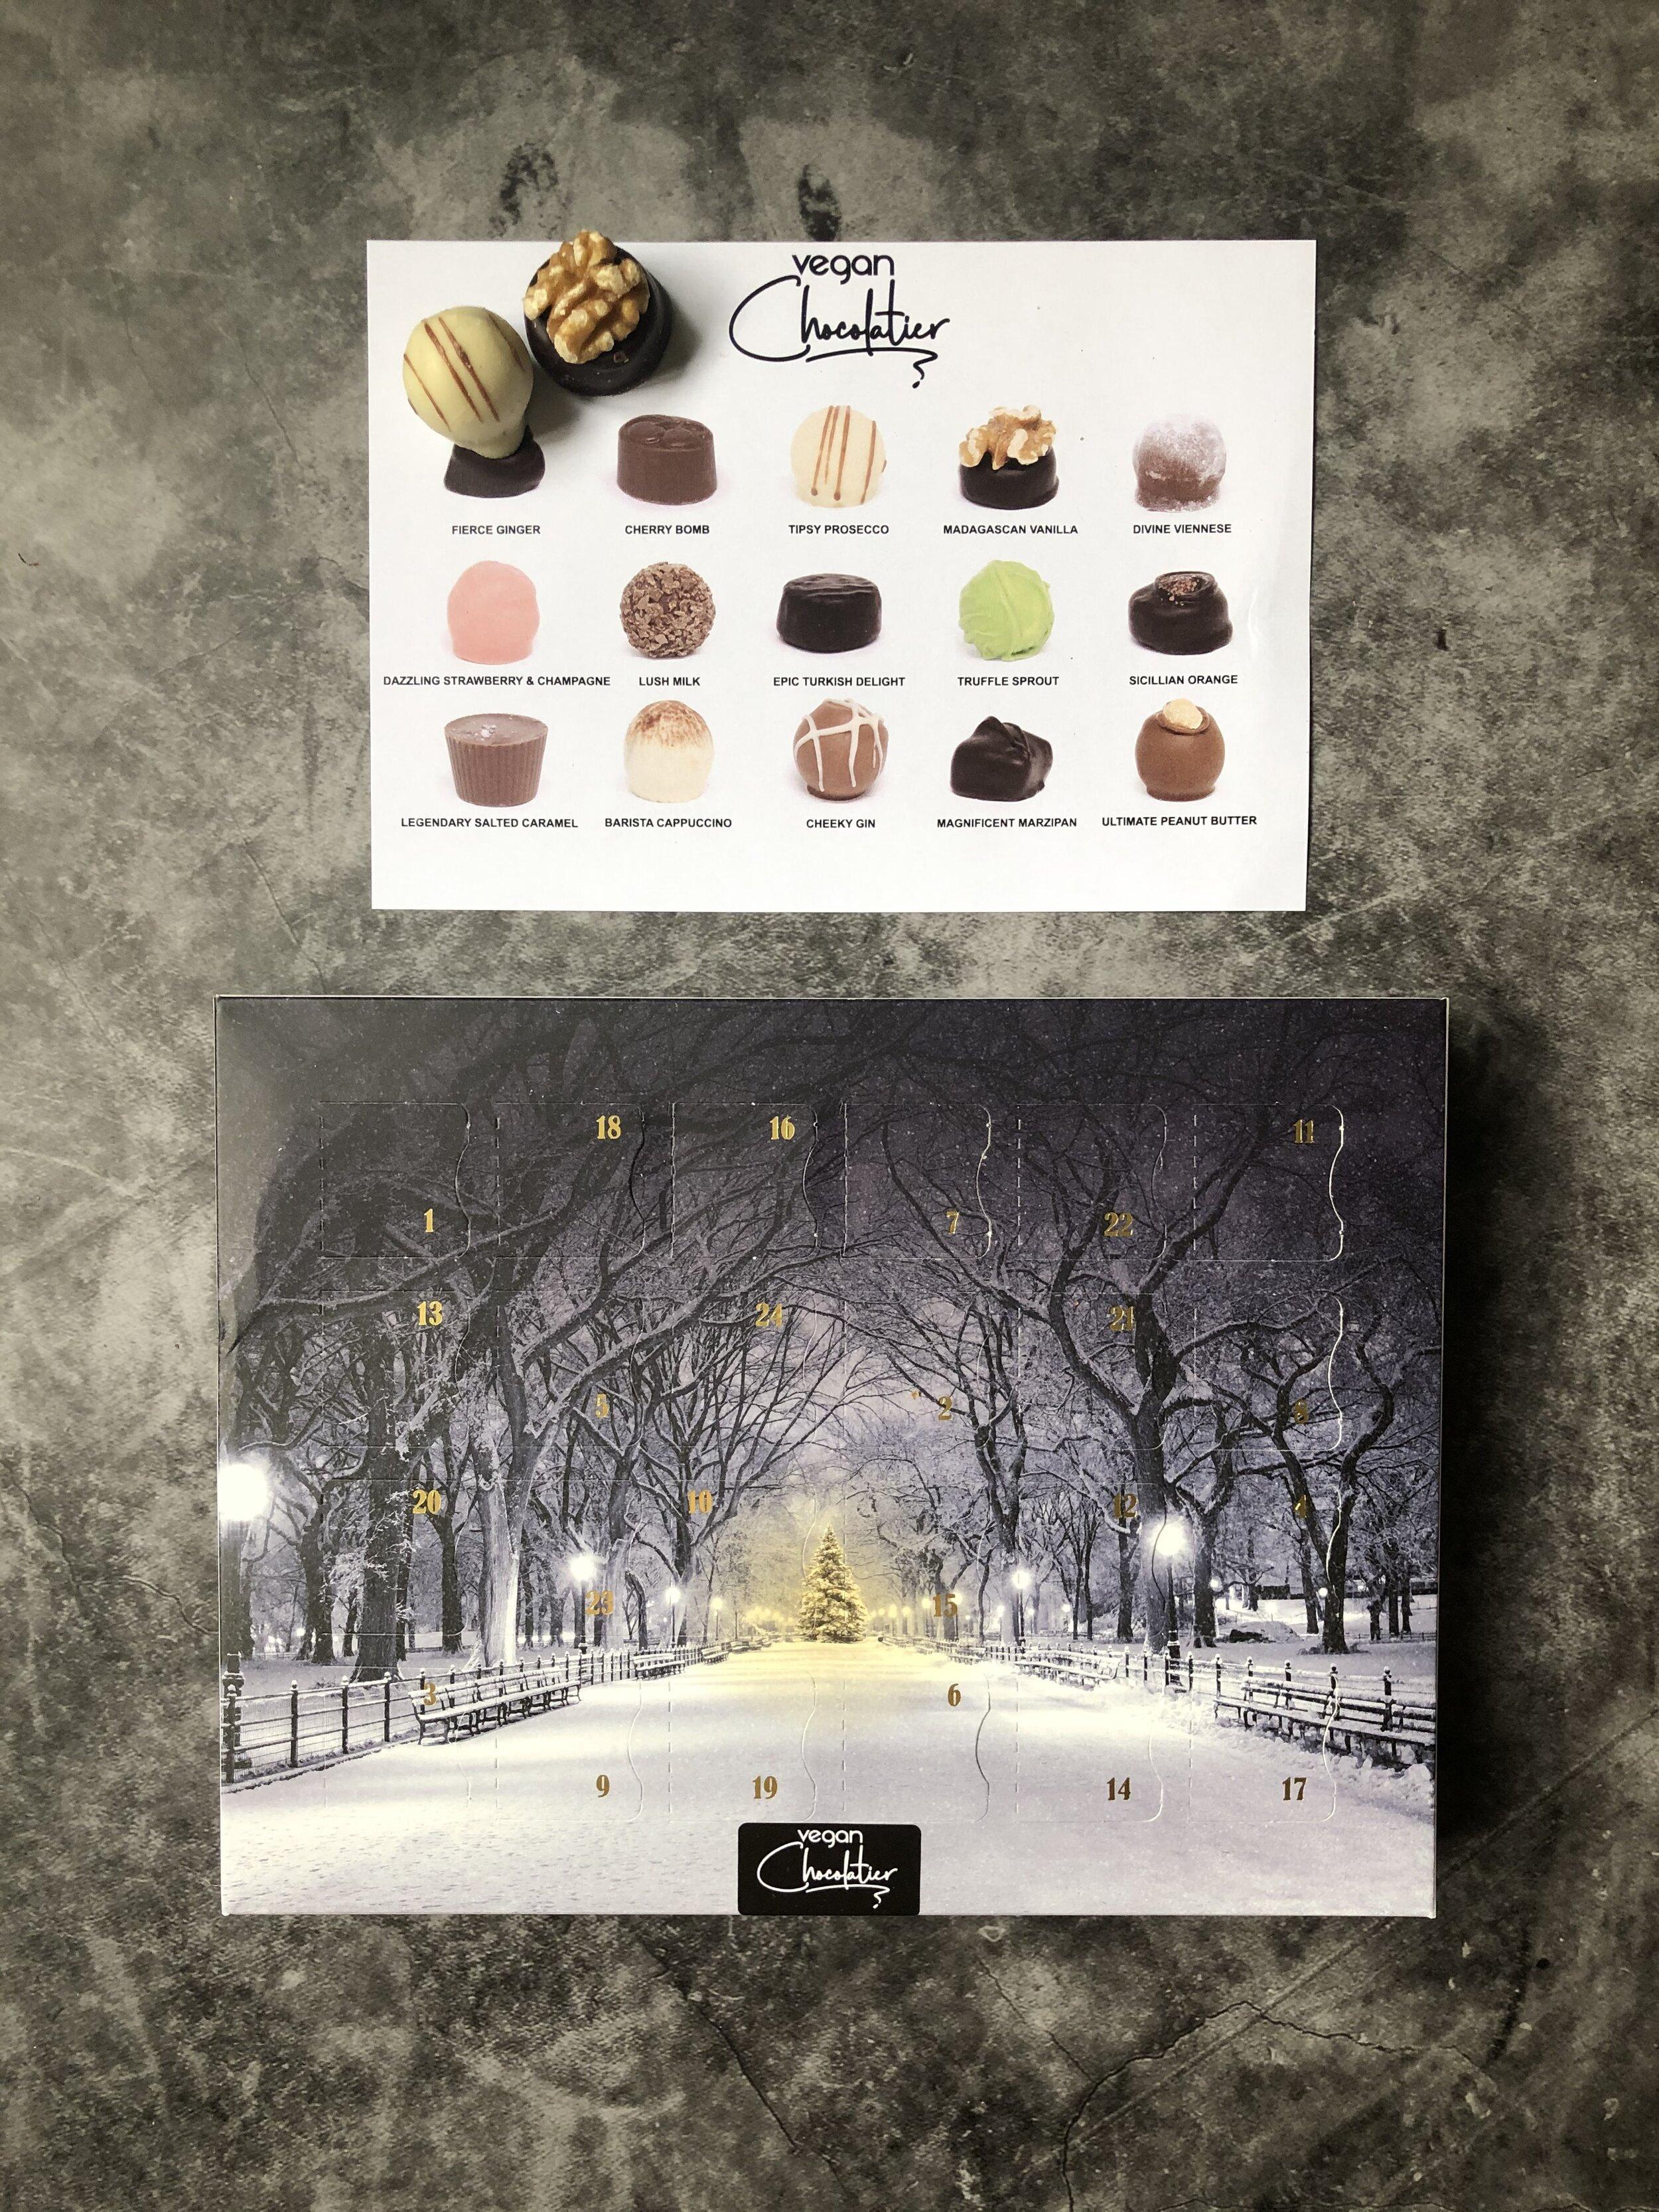 vegan chocolatier advent calendar